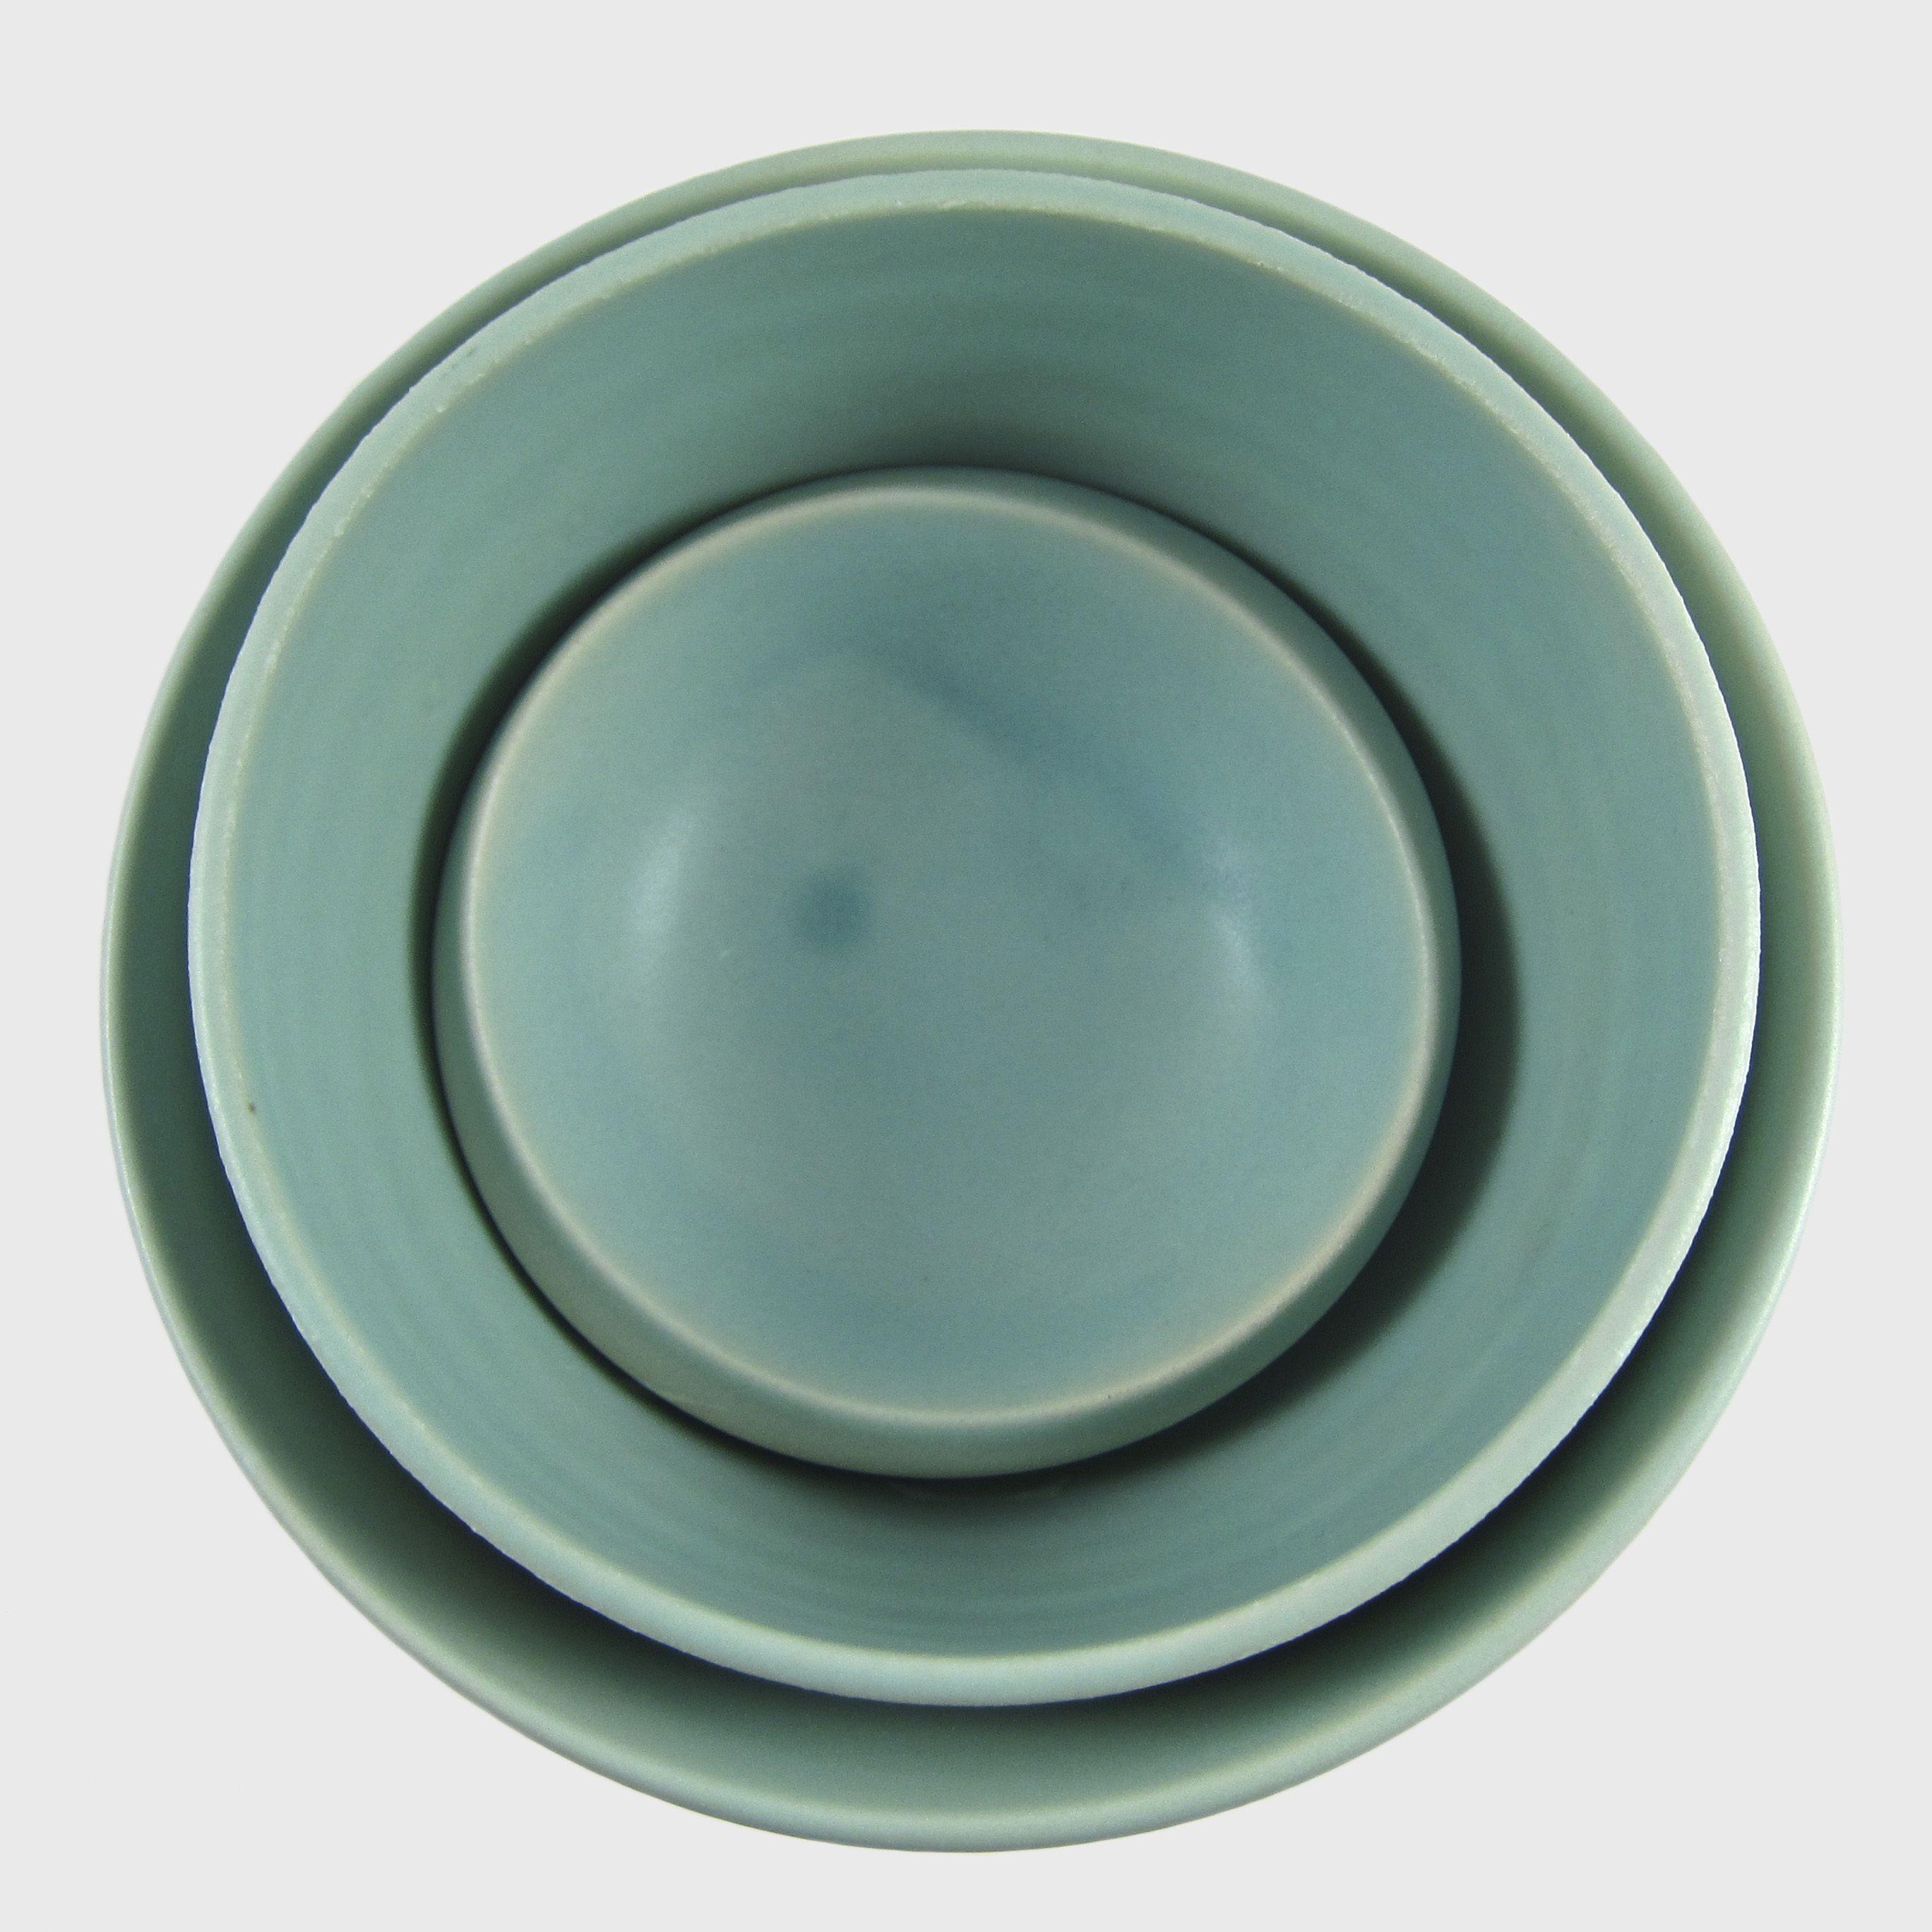 Japanese Matte Turquoise Ceramic Bowls